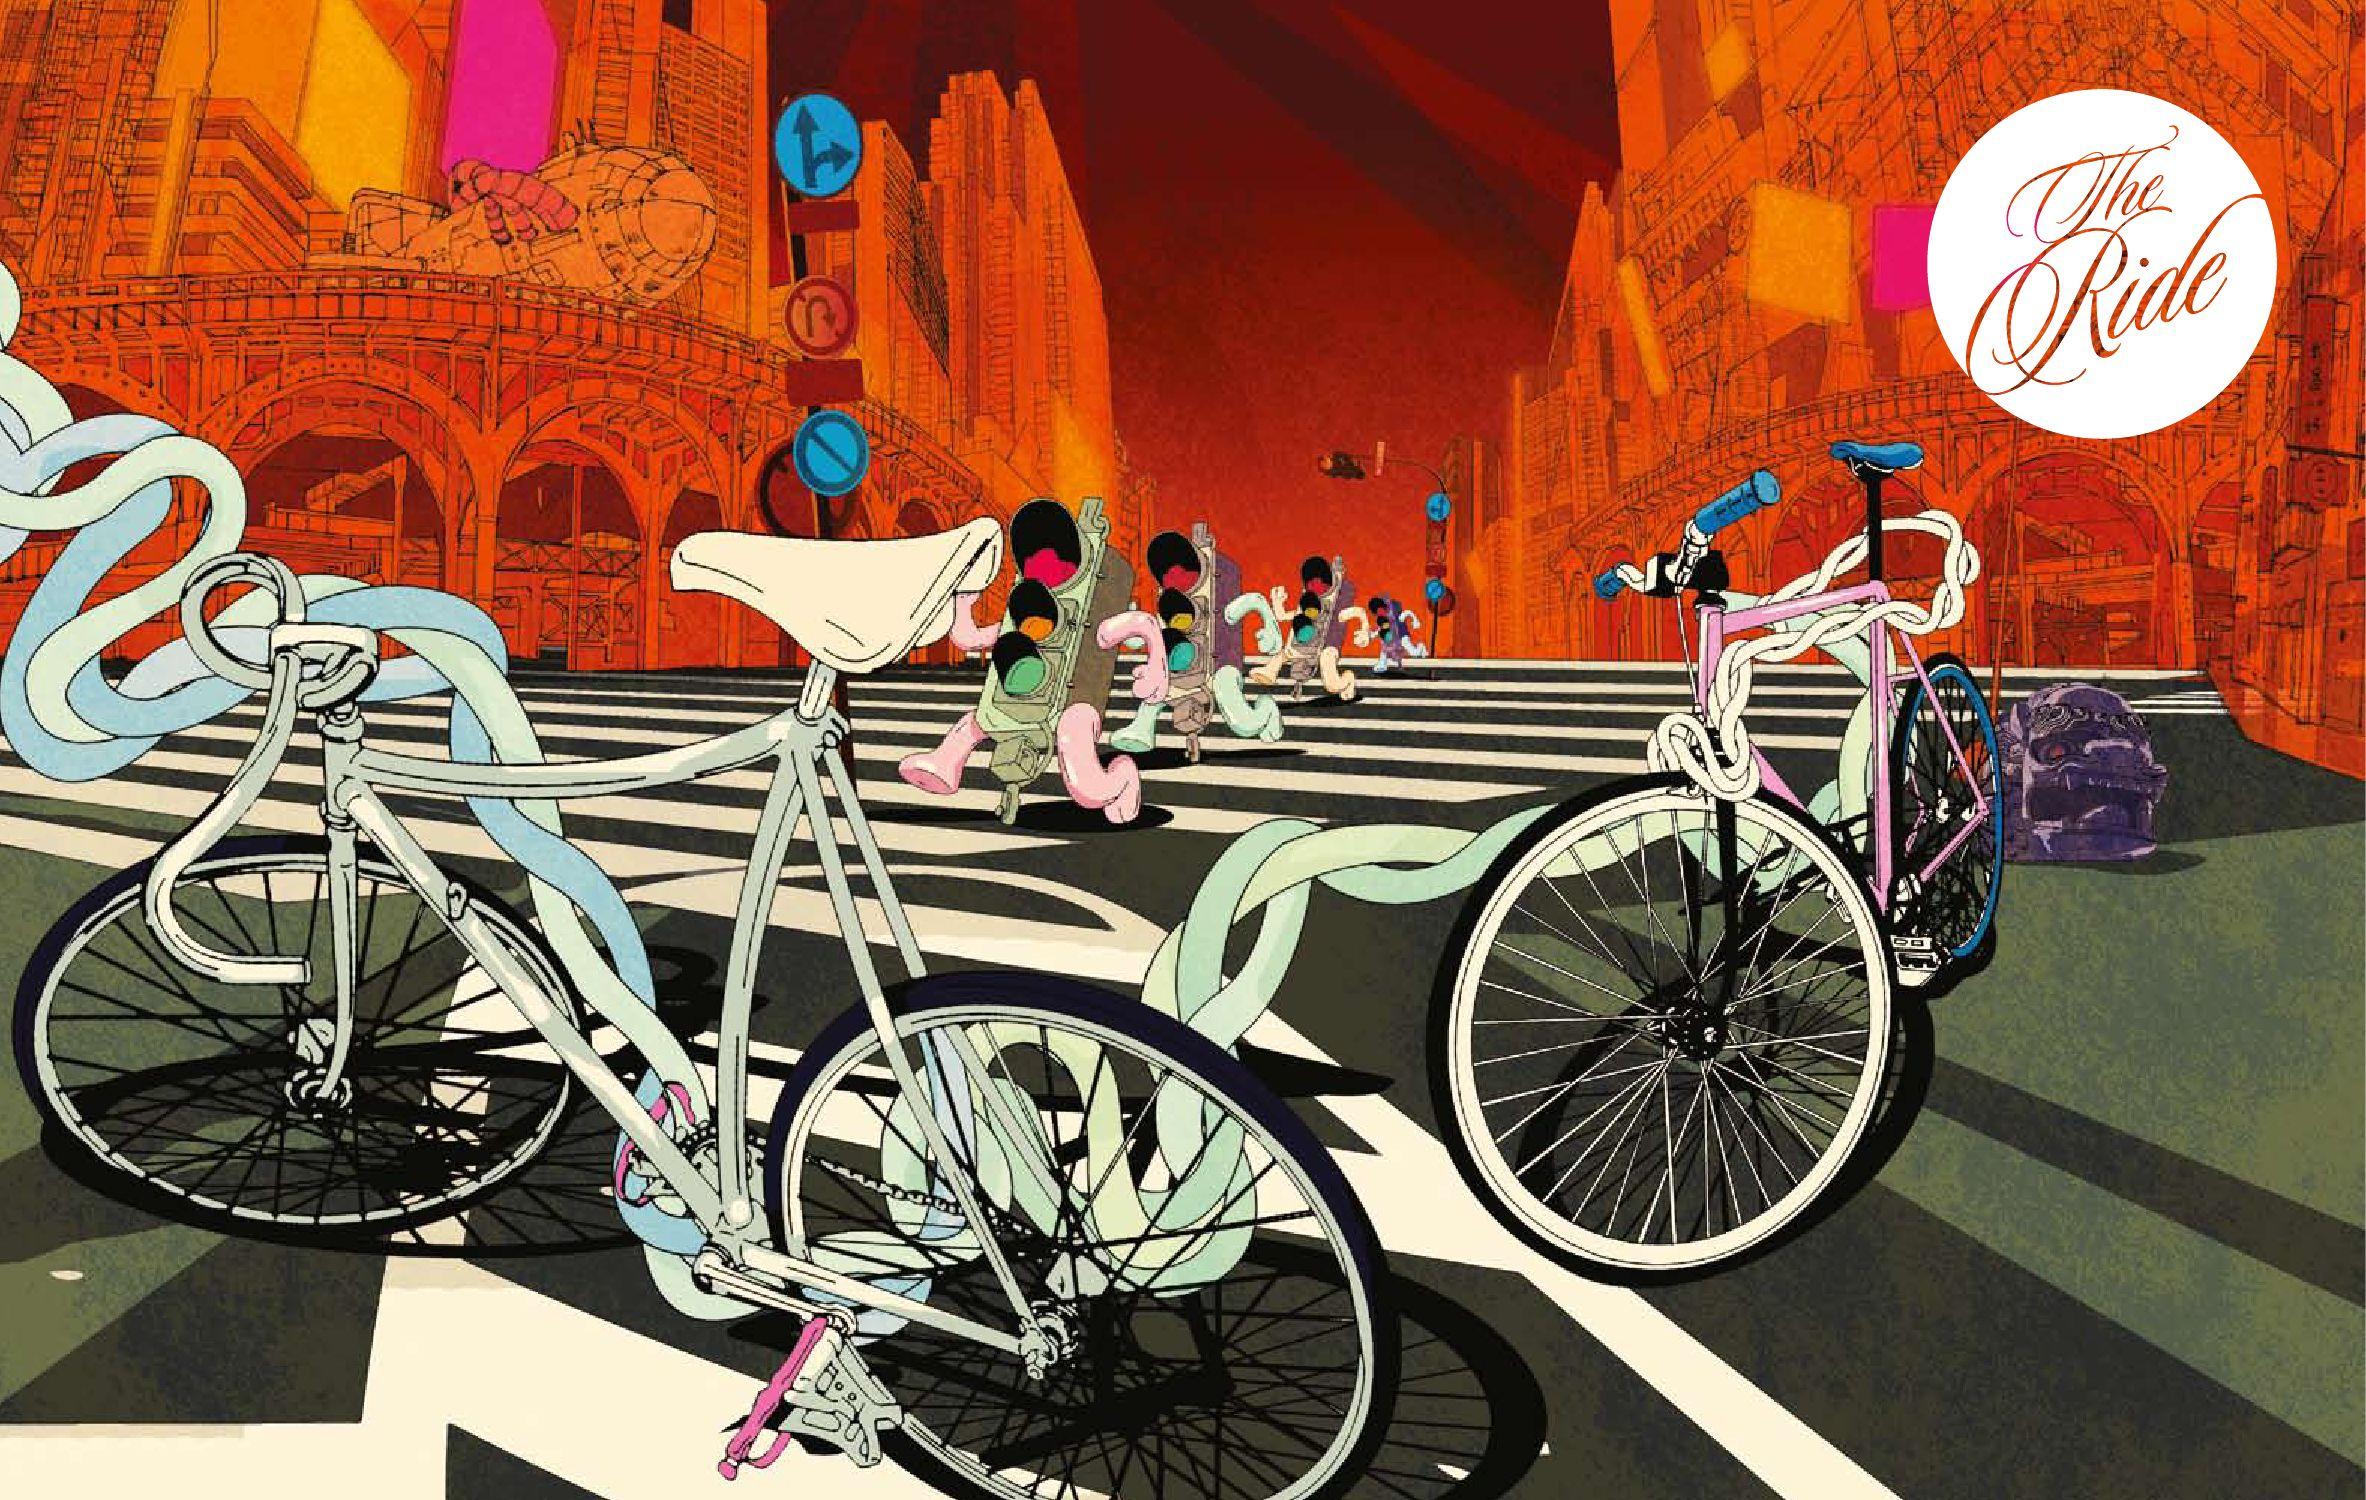 fc2950651ba The Ride - Issue #1 by Nicola Pittavino - issuu